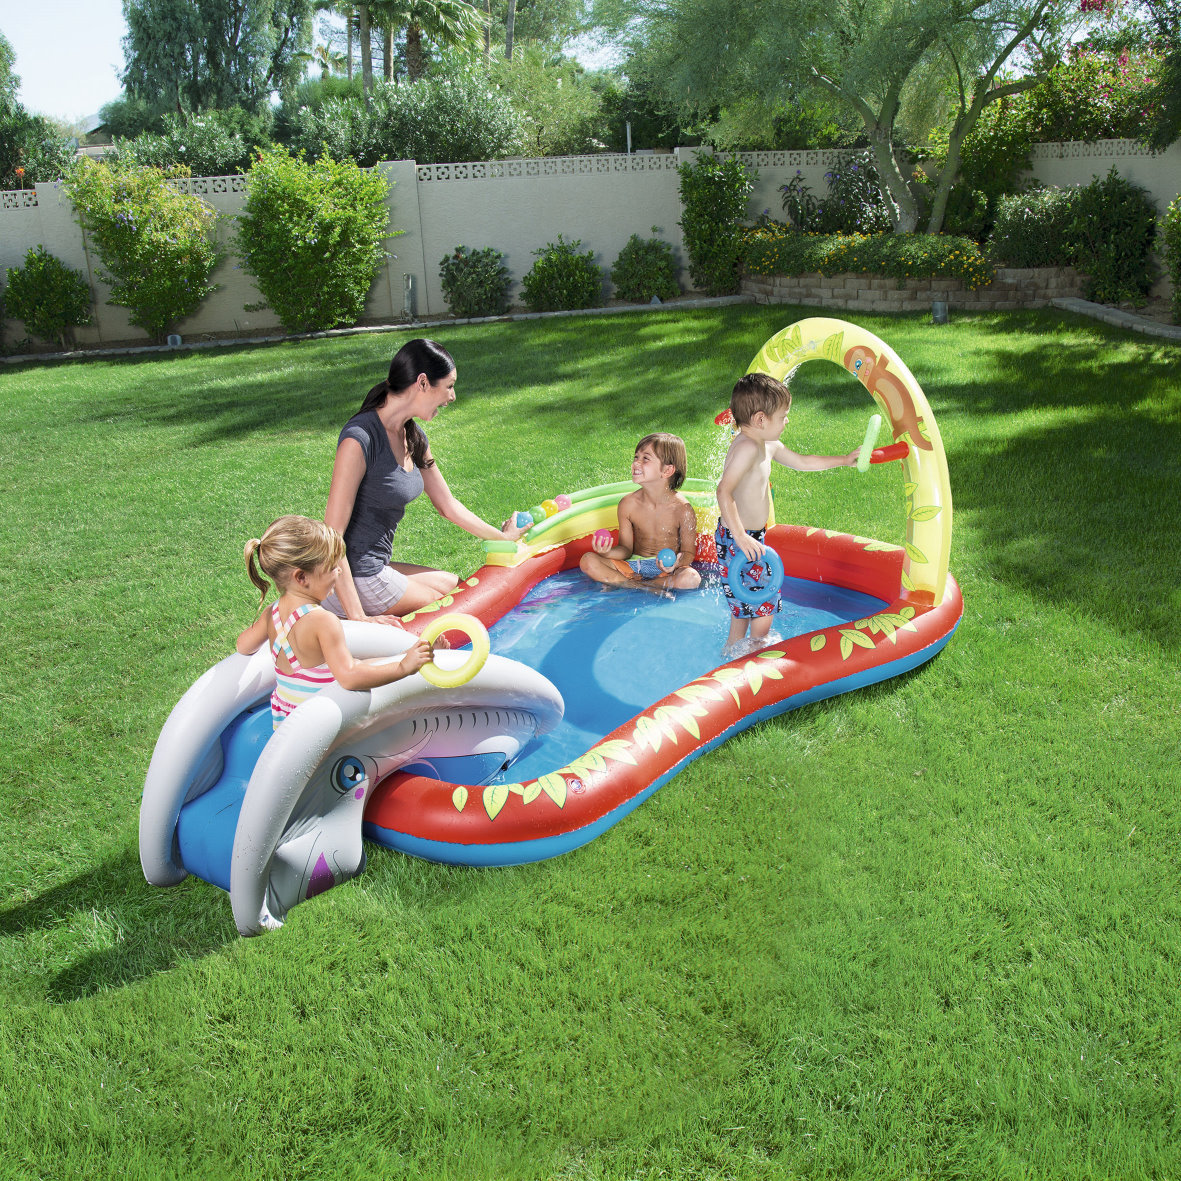 spielcenter mit rutsche pool swimmingpool planschbecken. Black Bedroom Furniture Sets. Home Design Ideas